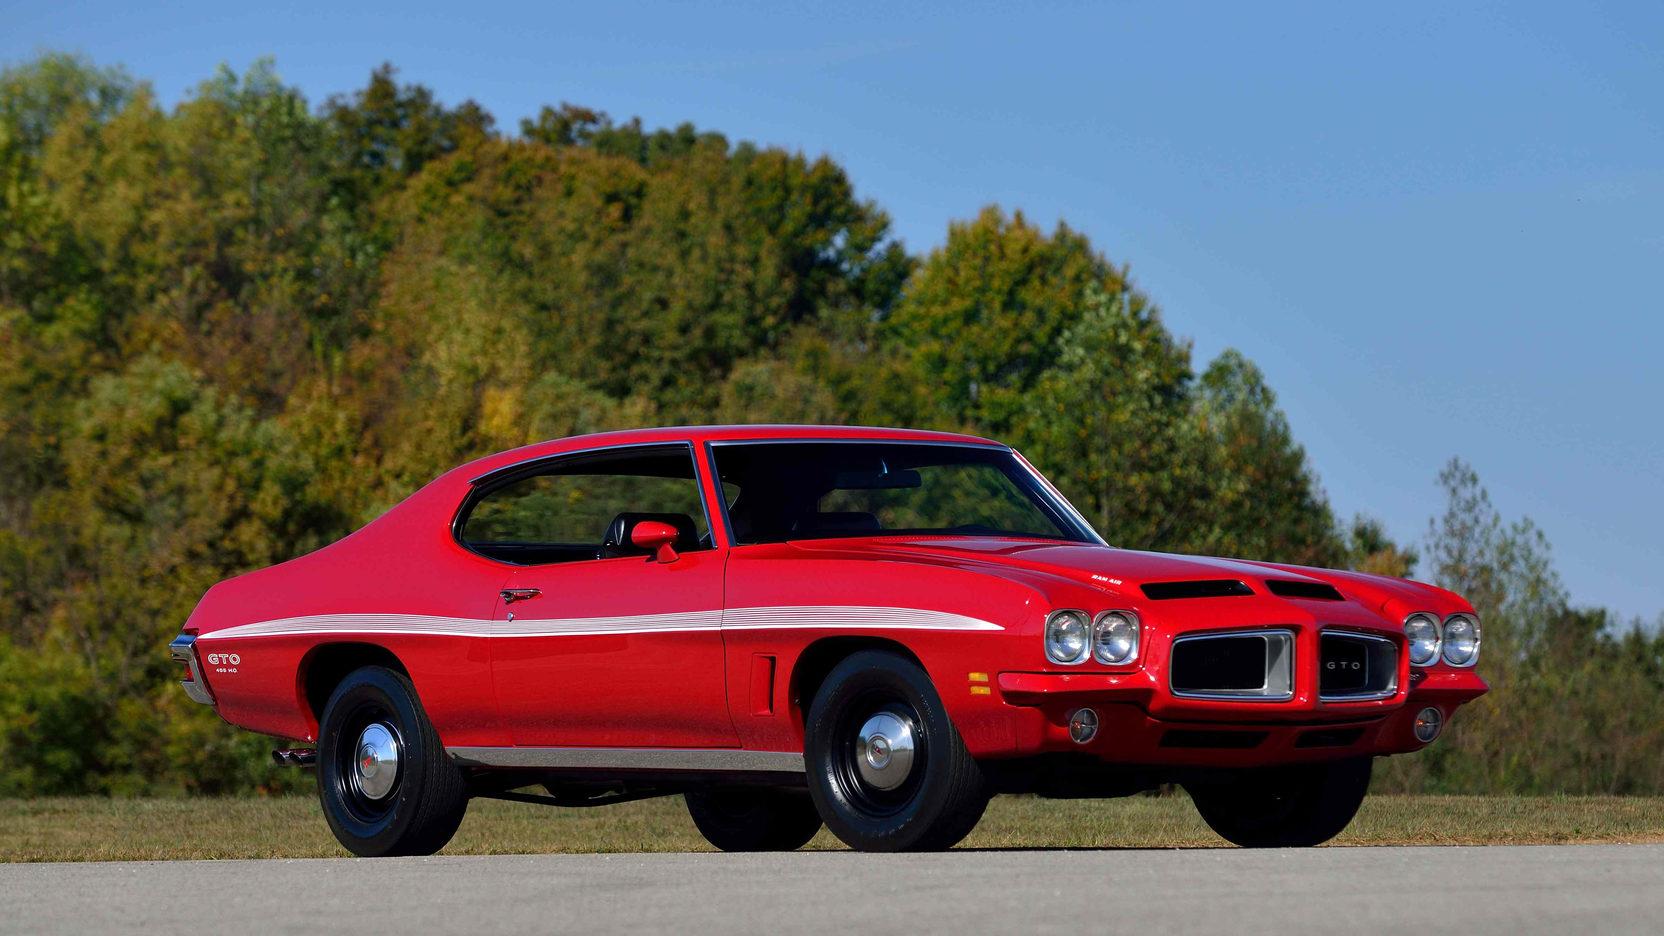 1972 Pontiac GTO front 3/4